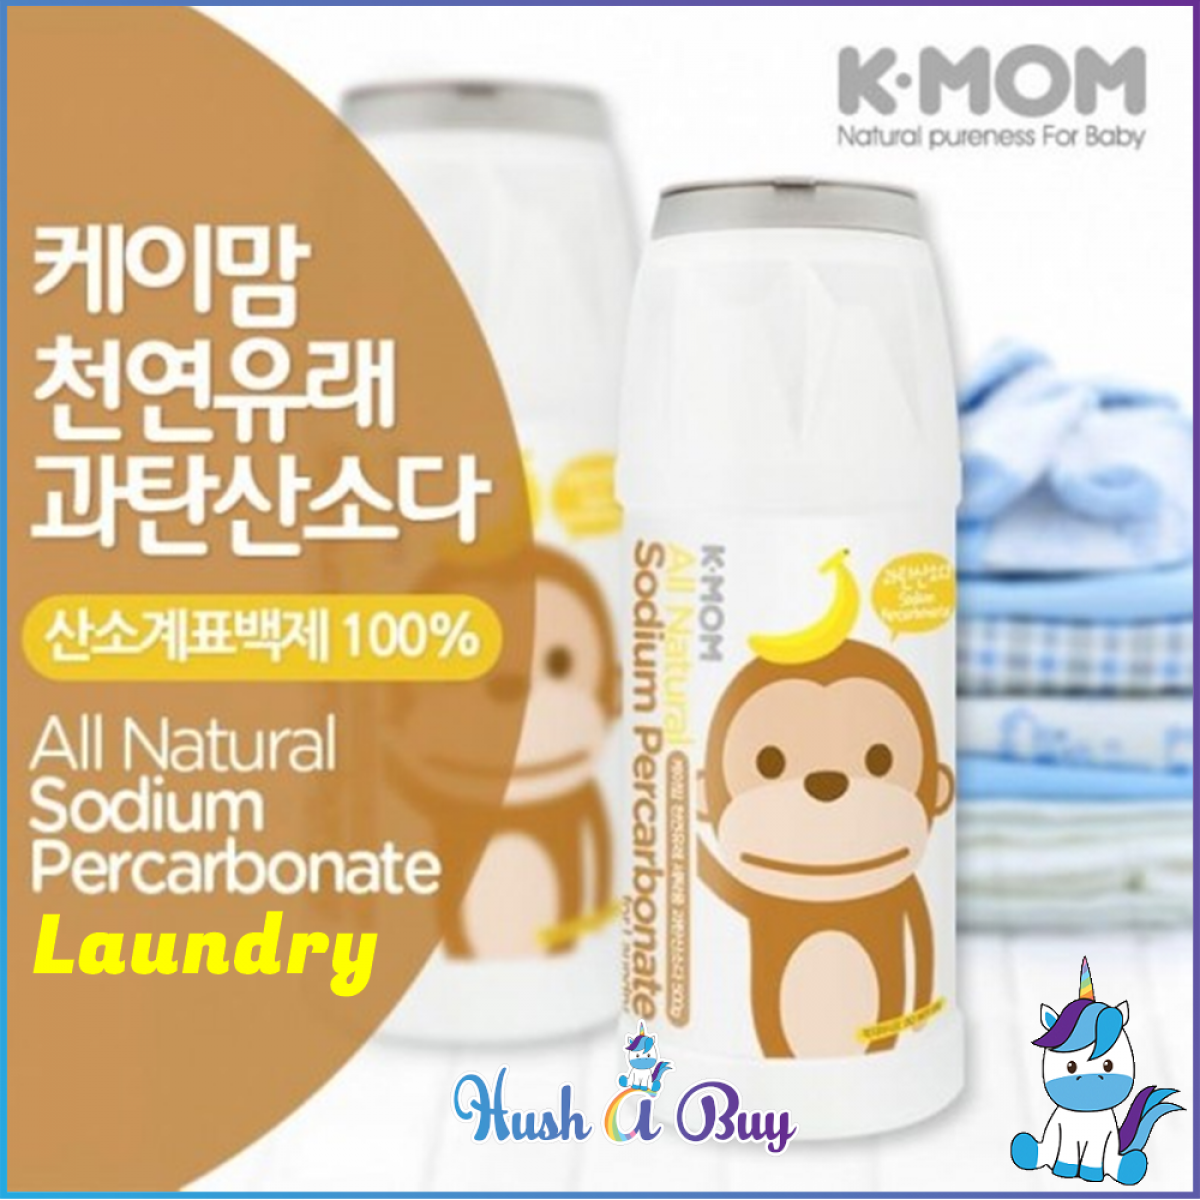 K-Mom KMOM Powder Detergent / Baking Soda for Kitchen / Citric Acid for Bathroom / Sodium Carbo